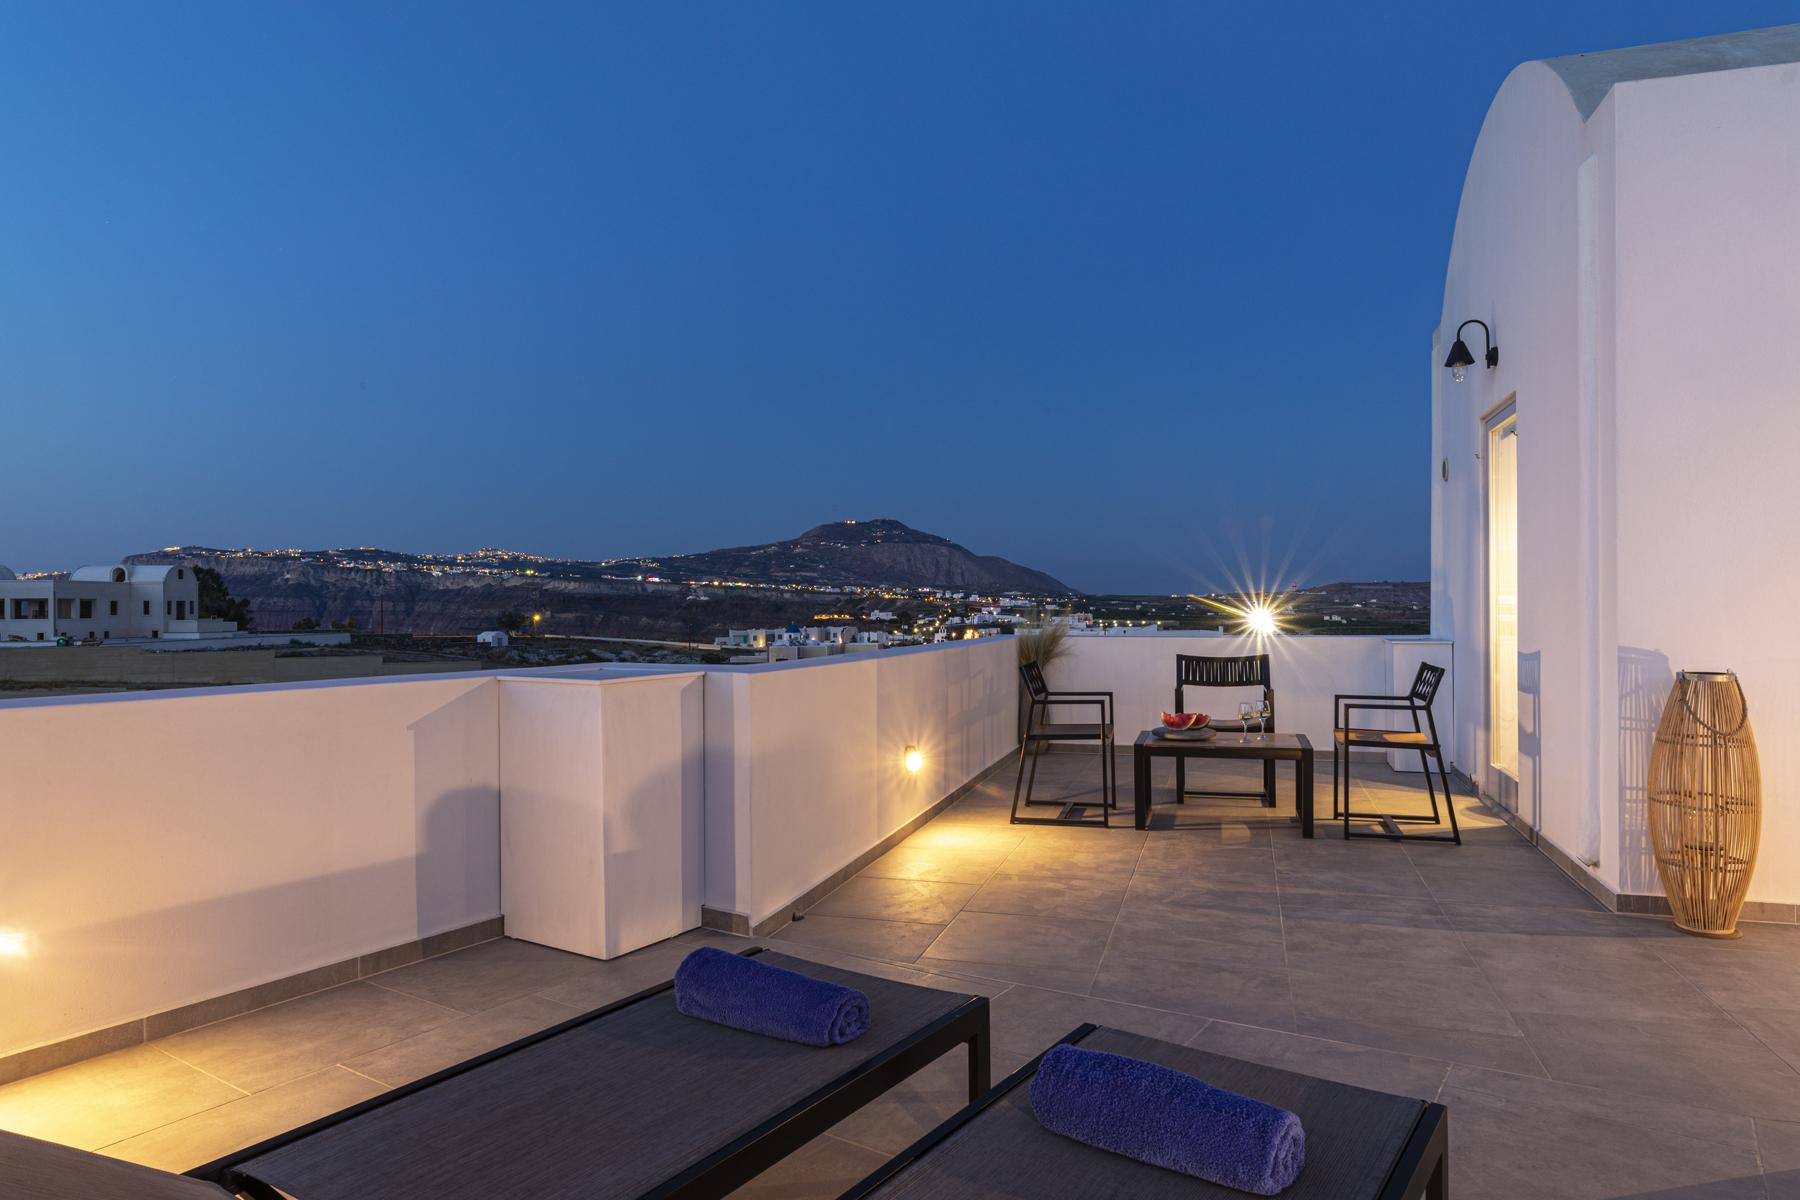 Alafropetra Luxury Suites - Suite 4 - Caldera view - Balcony